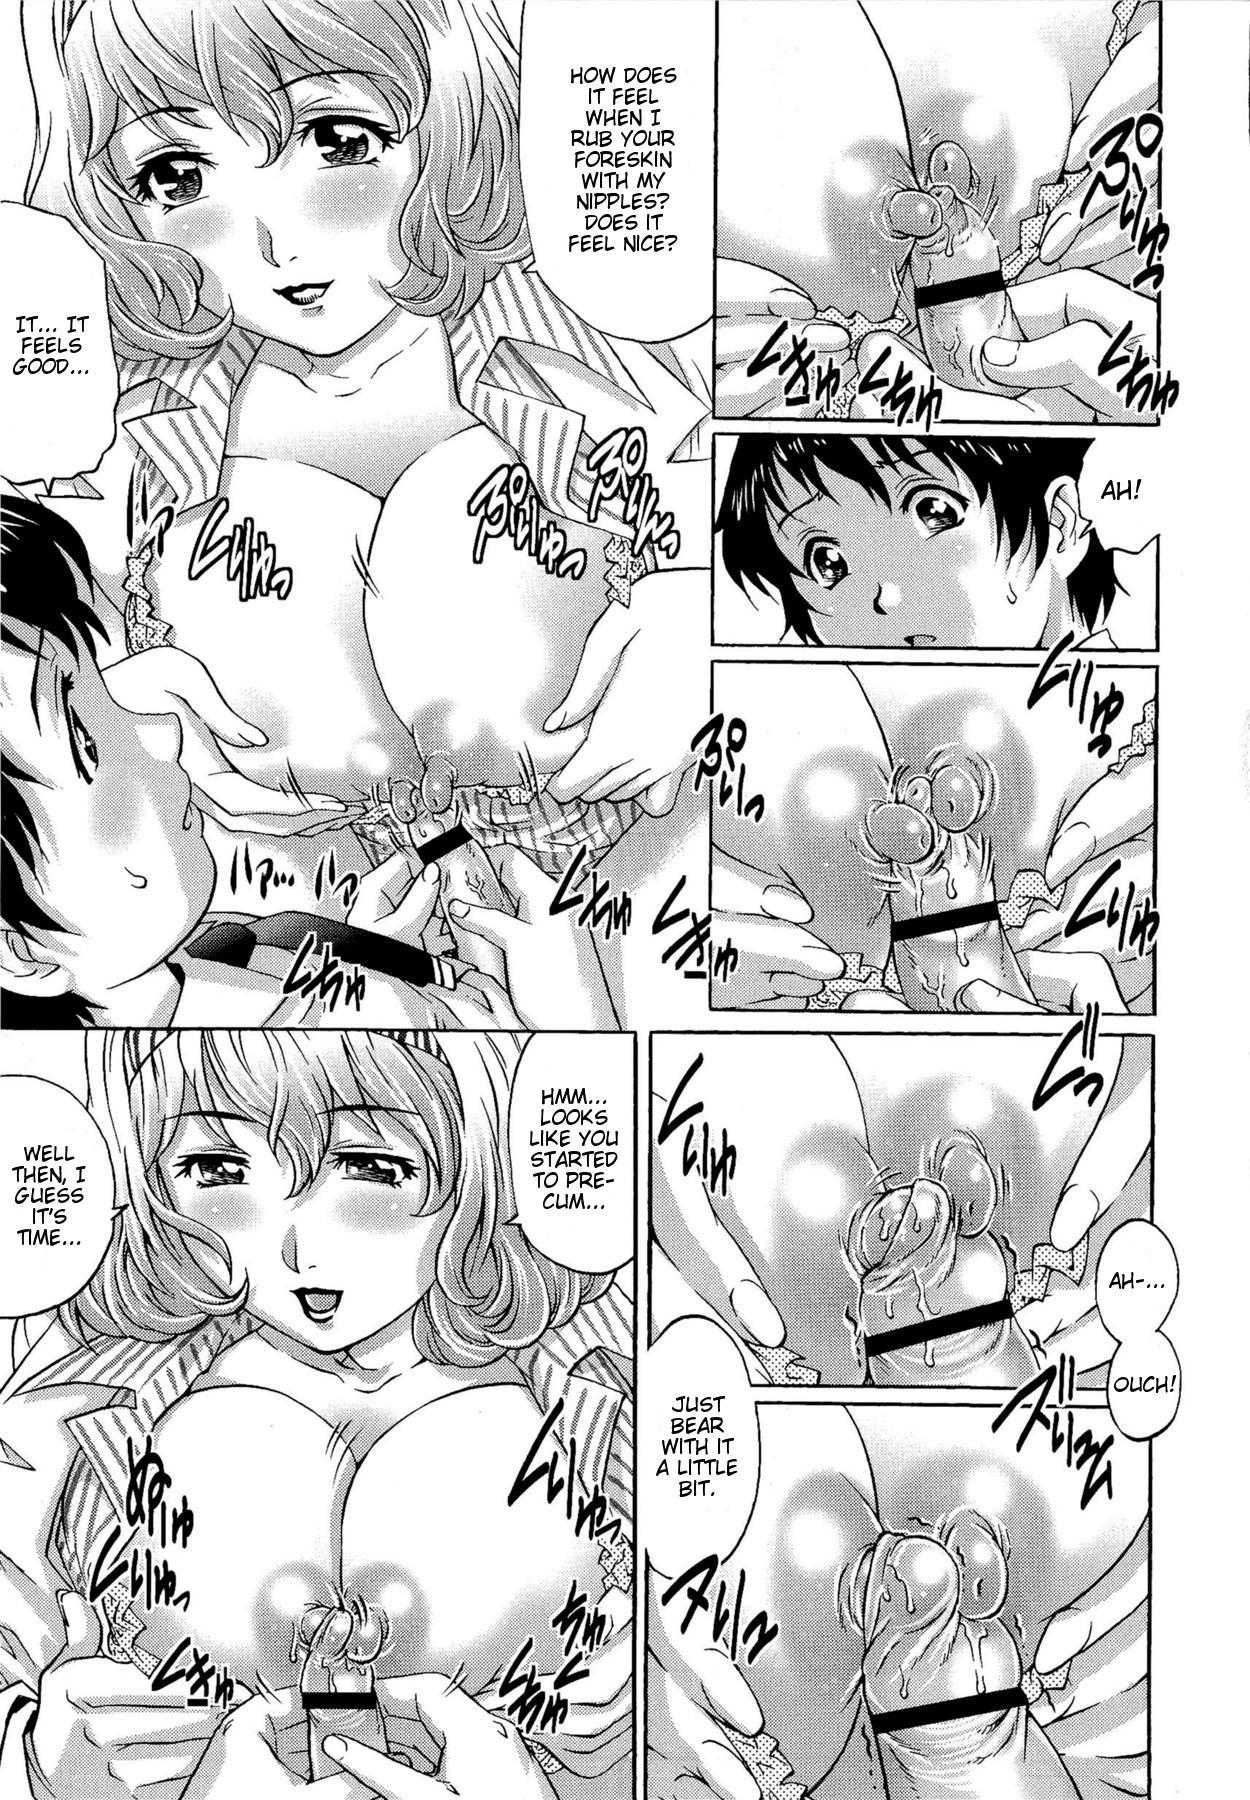 [Yanagawa Rio] Doutei Lovers   Virgin Lovers - Ch 1- 10 [English] {Taihen Zombii, JT Anonymus} 88